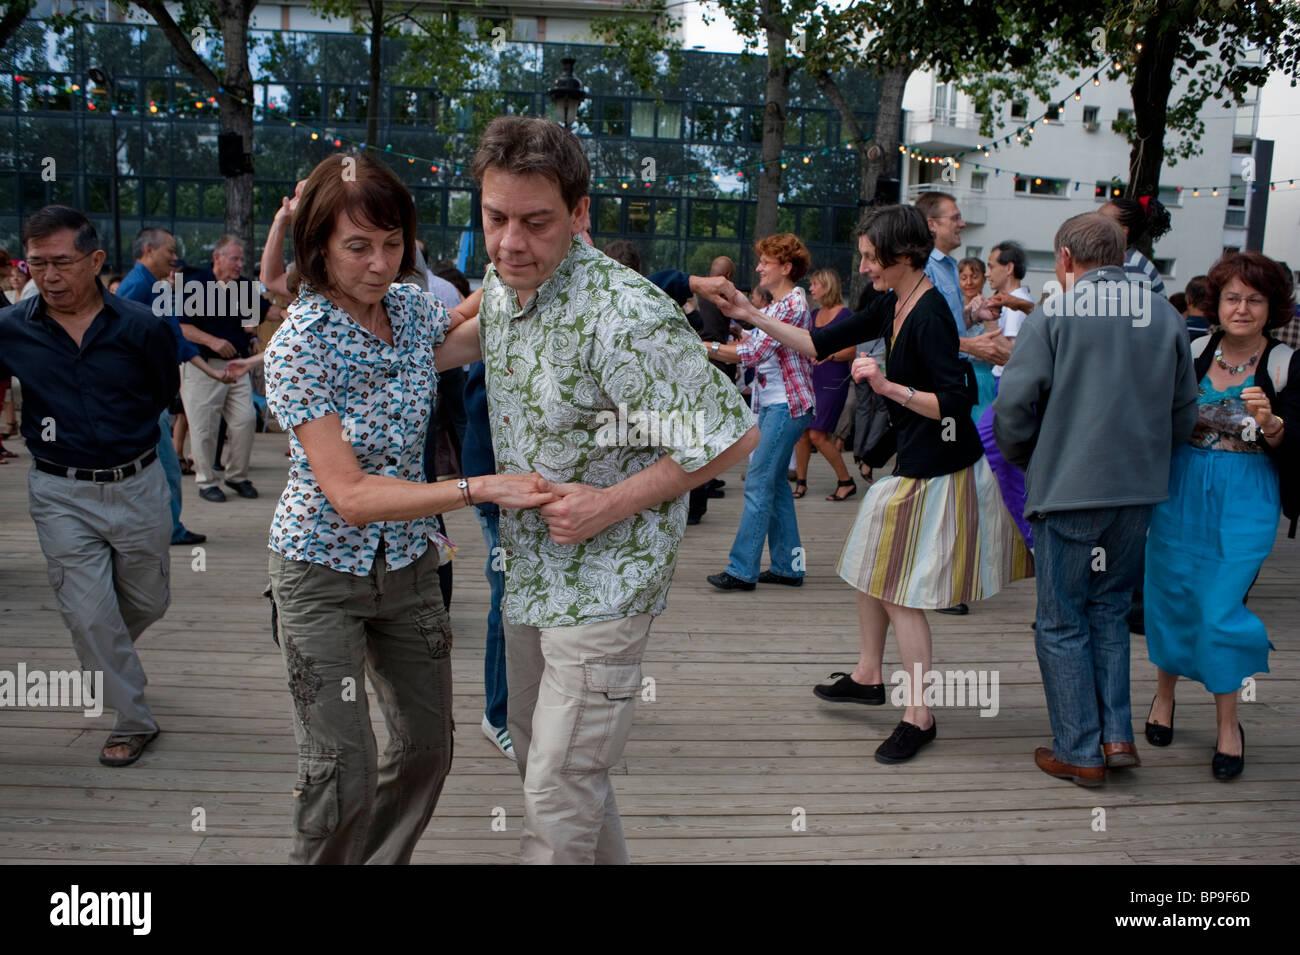 Paris, France, Adult Couples, Rock n Roll Style Street Dancing at 'Paris Plages' Dance River Seine adult - Stock Image